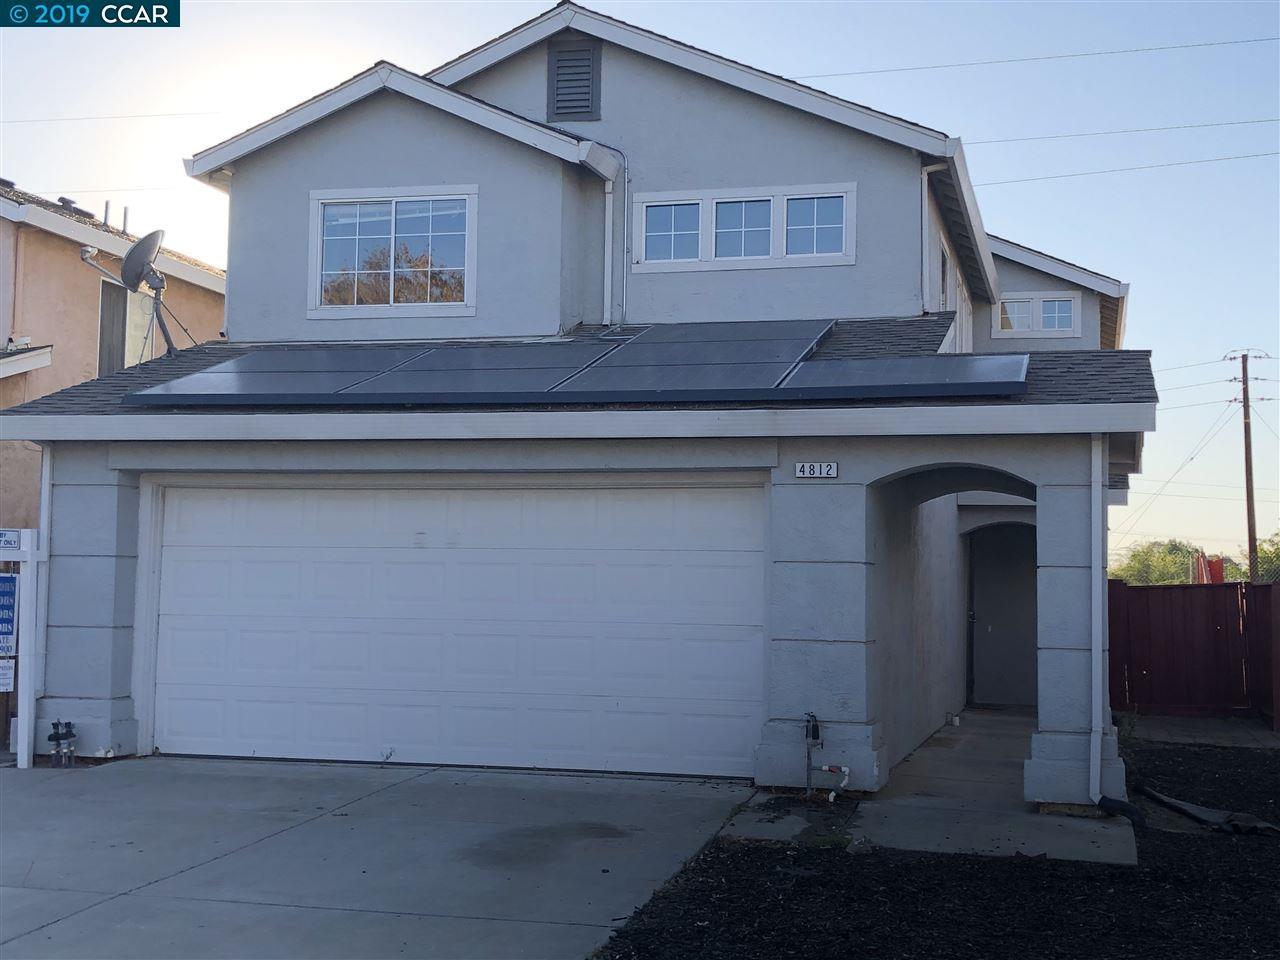 4812 Bayside Way, OAKLEY, CA 94561